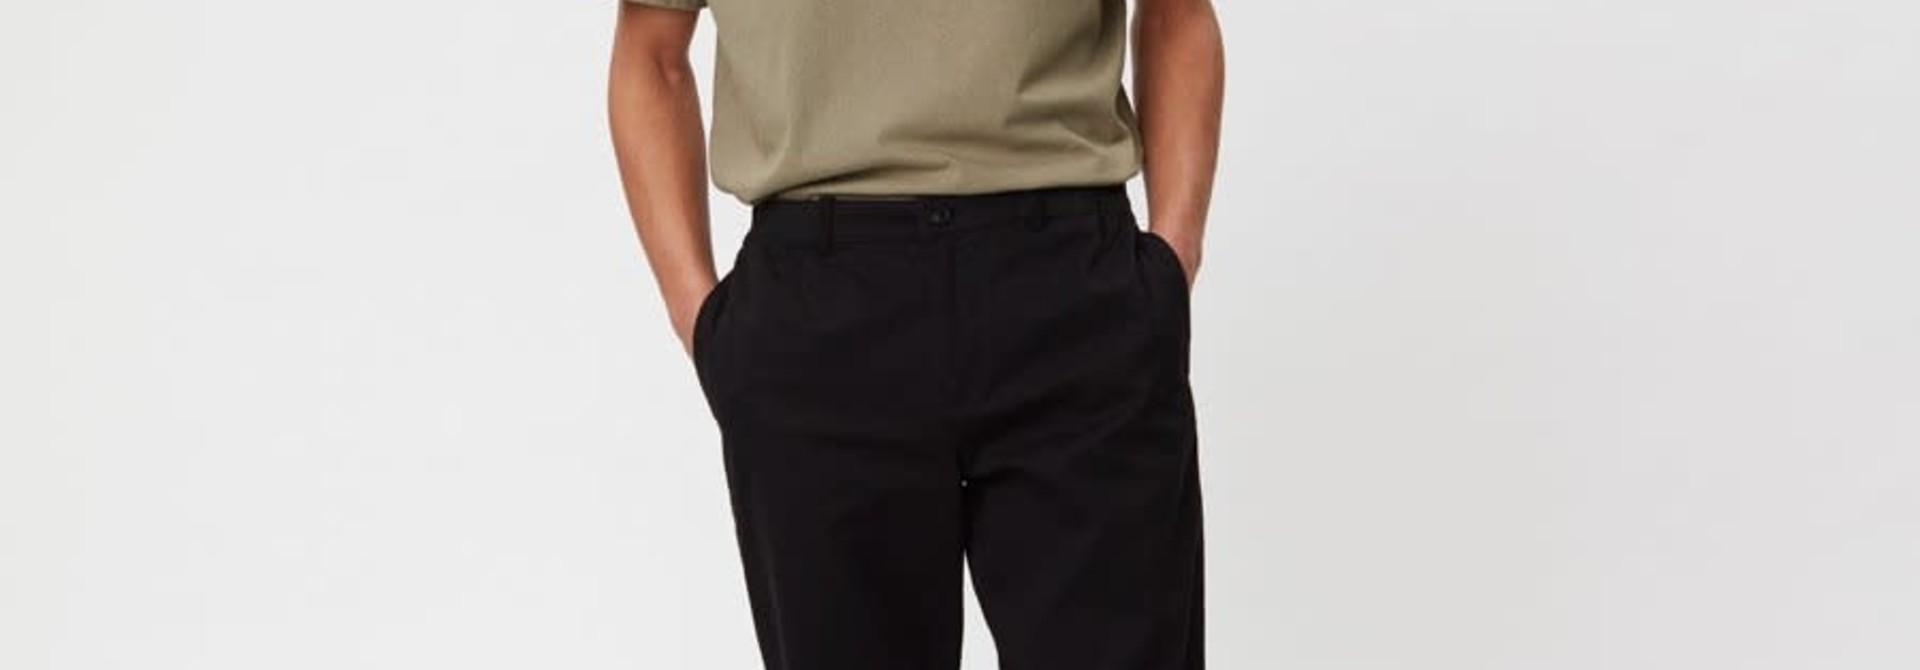 Delano Cotton T-Shirt Sage Green